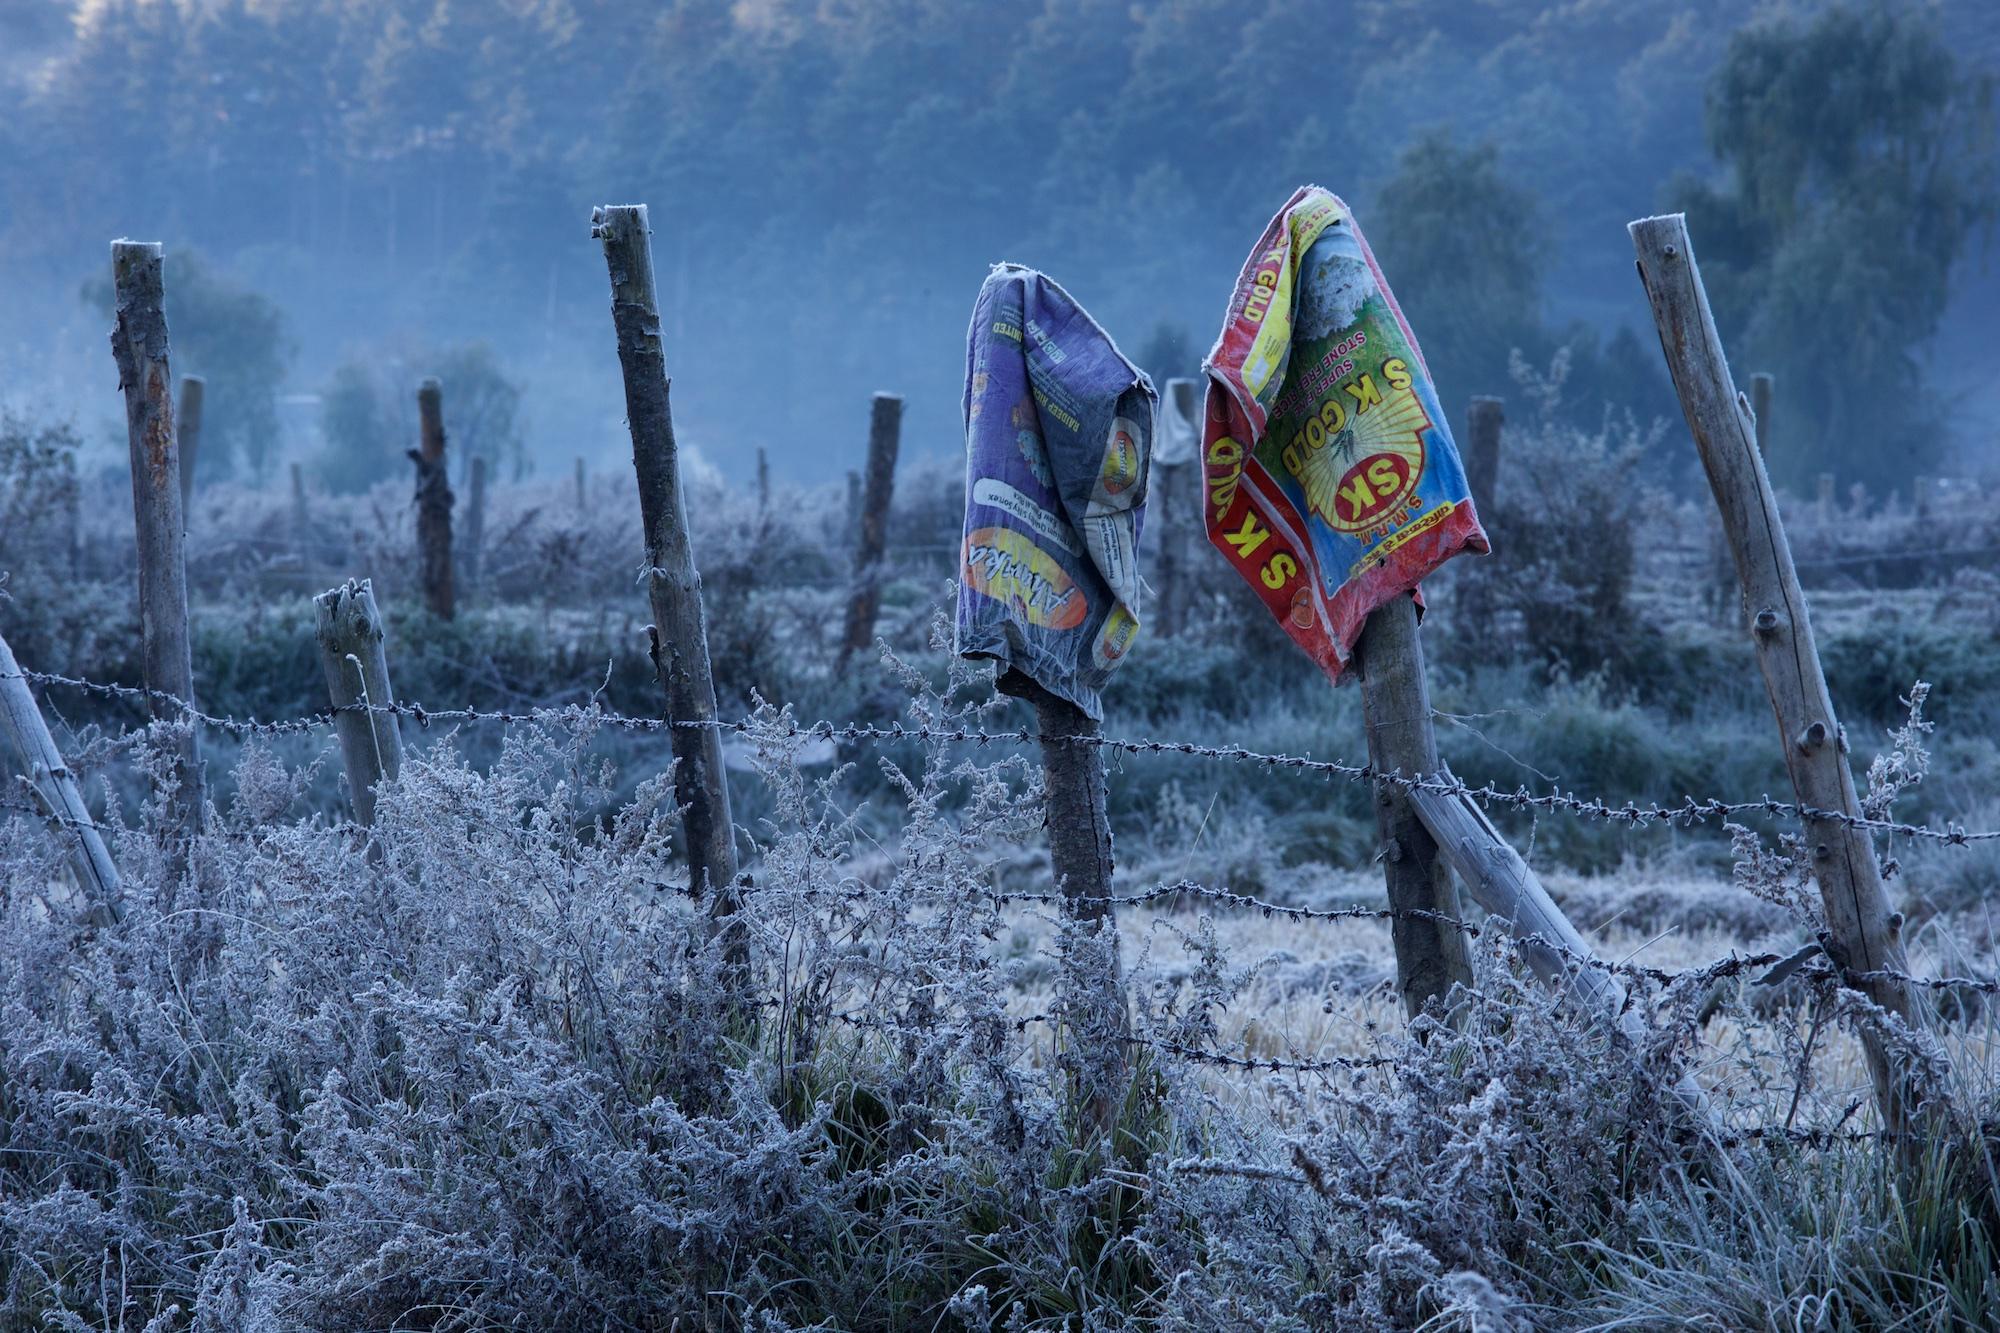 Bhutan-2016- C26O9461.jpg